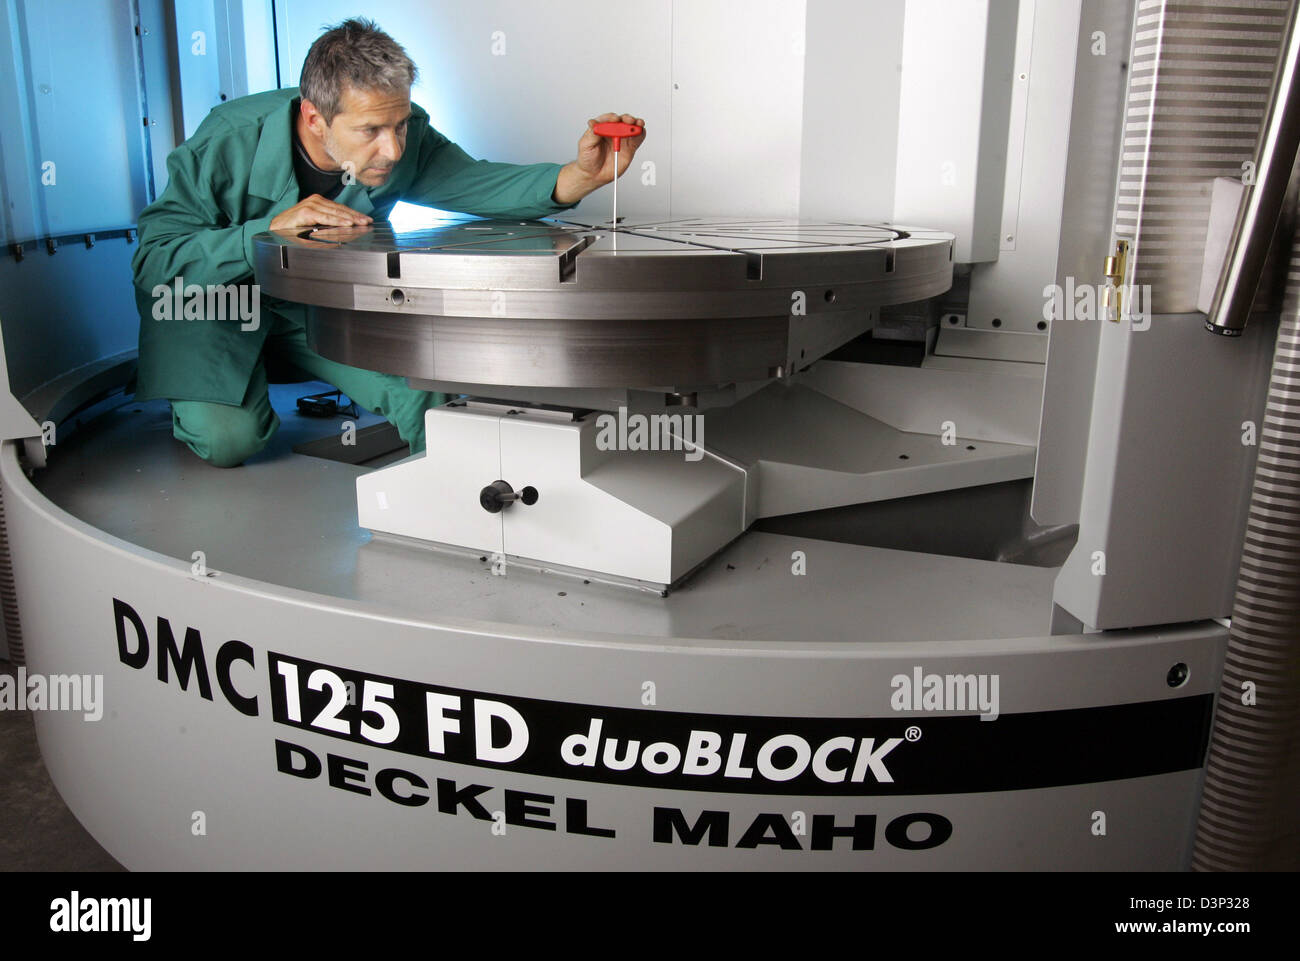 Ulrich gunkel employee of 39 deckel maho 39 part of the for Pfronten deckel maho